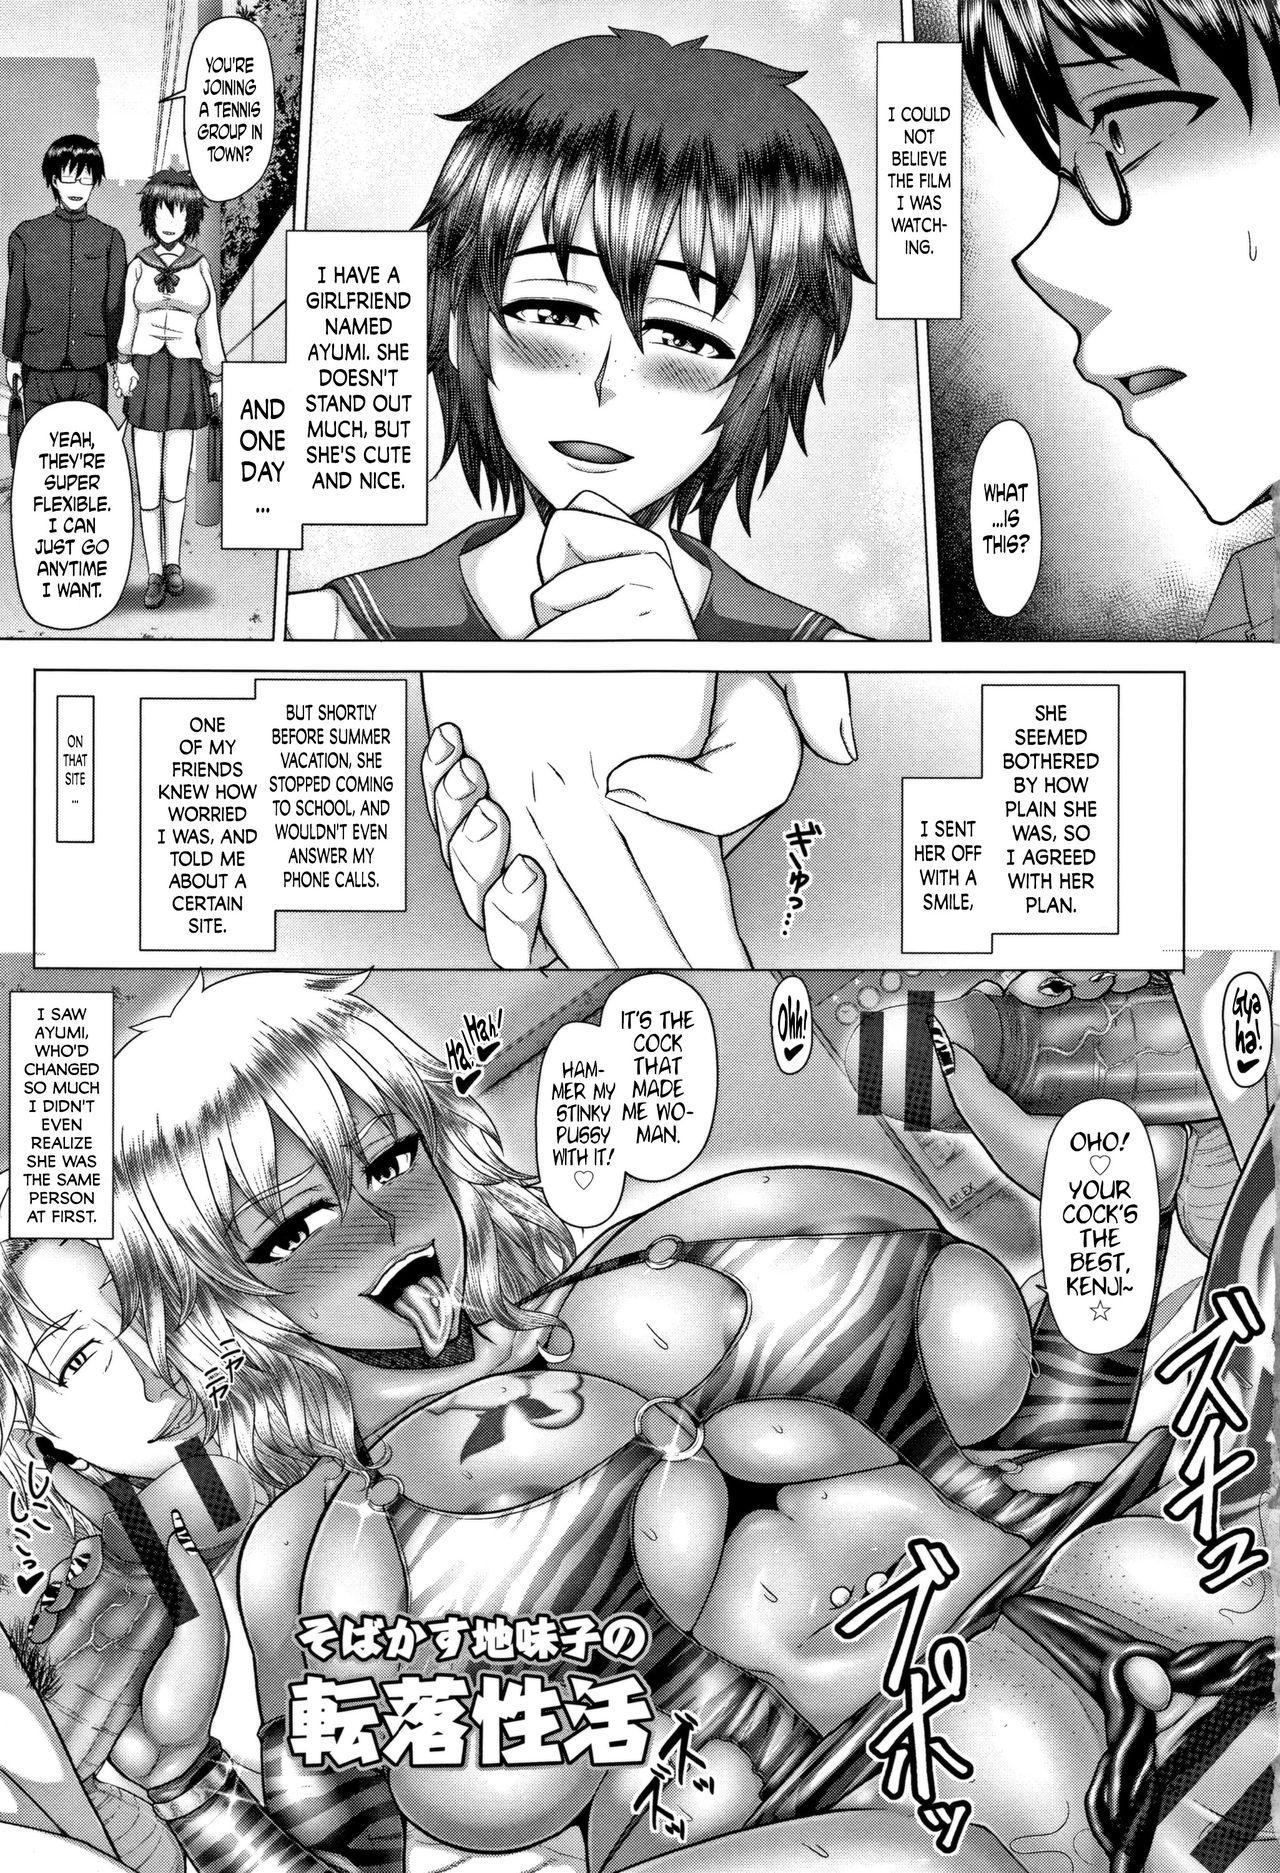 [Inoue Nanaki] Joushiki Daha! Kuro Gal Bitch-ka Seikatsu Ch. 1-3, 5-8 [English] [Dark Mac + N04h] 6